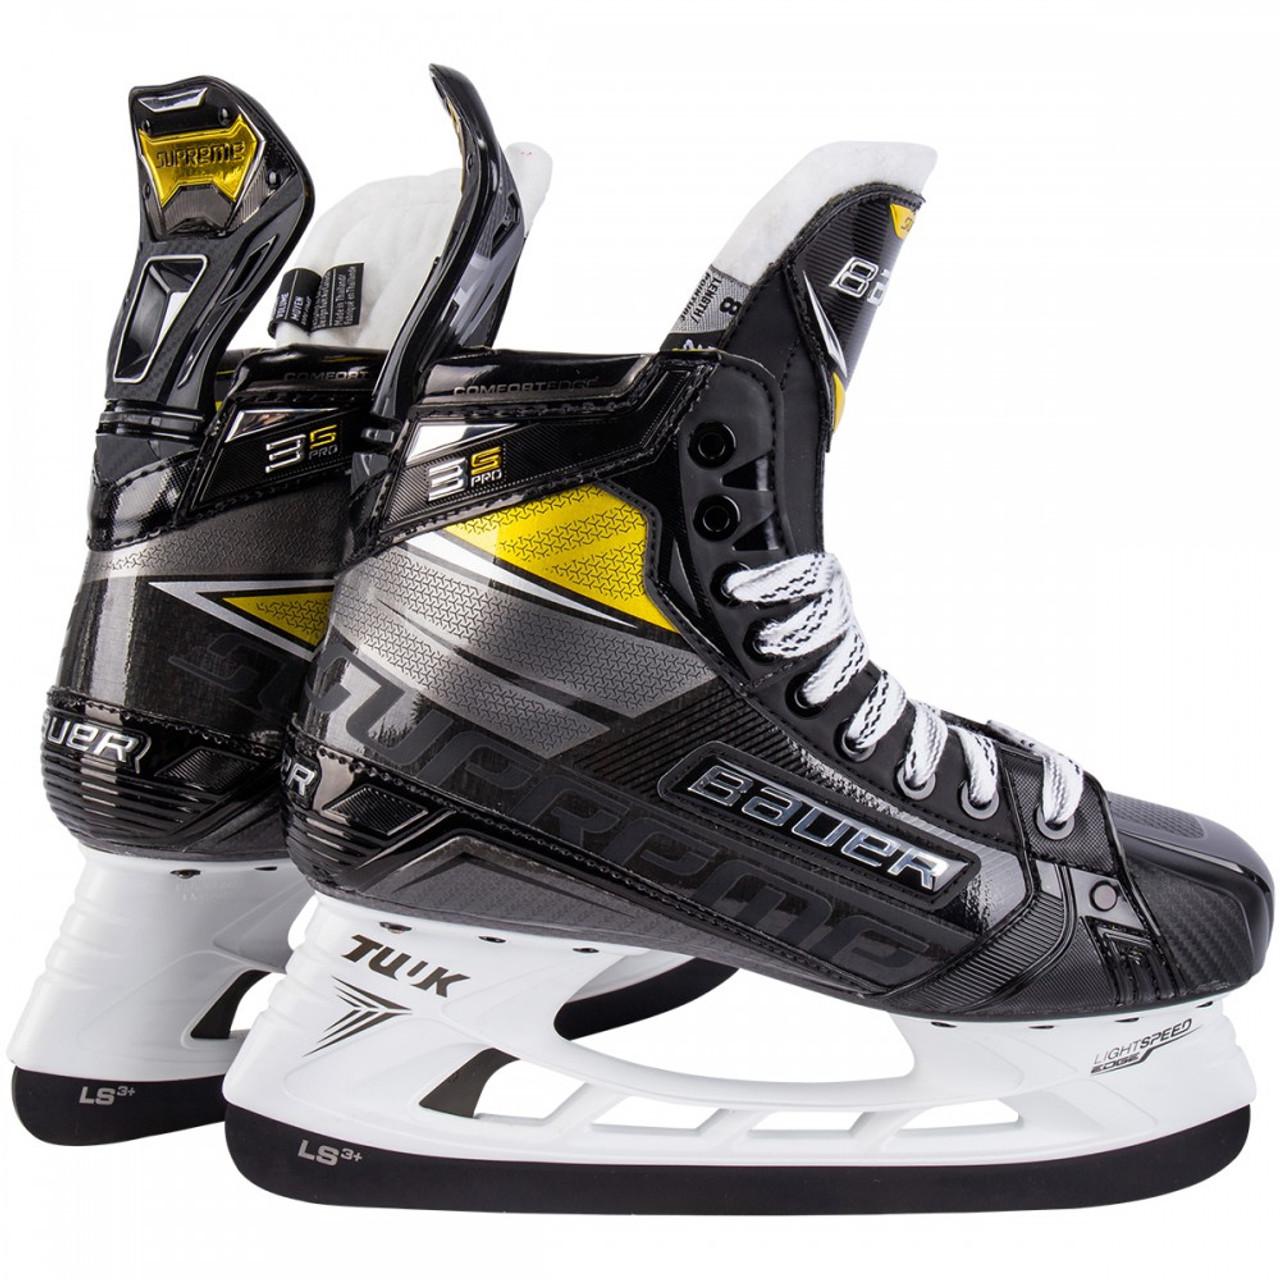 Bauer Supreme 3s Pro Hockey Skates Sr